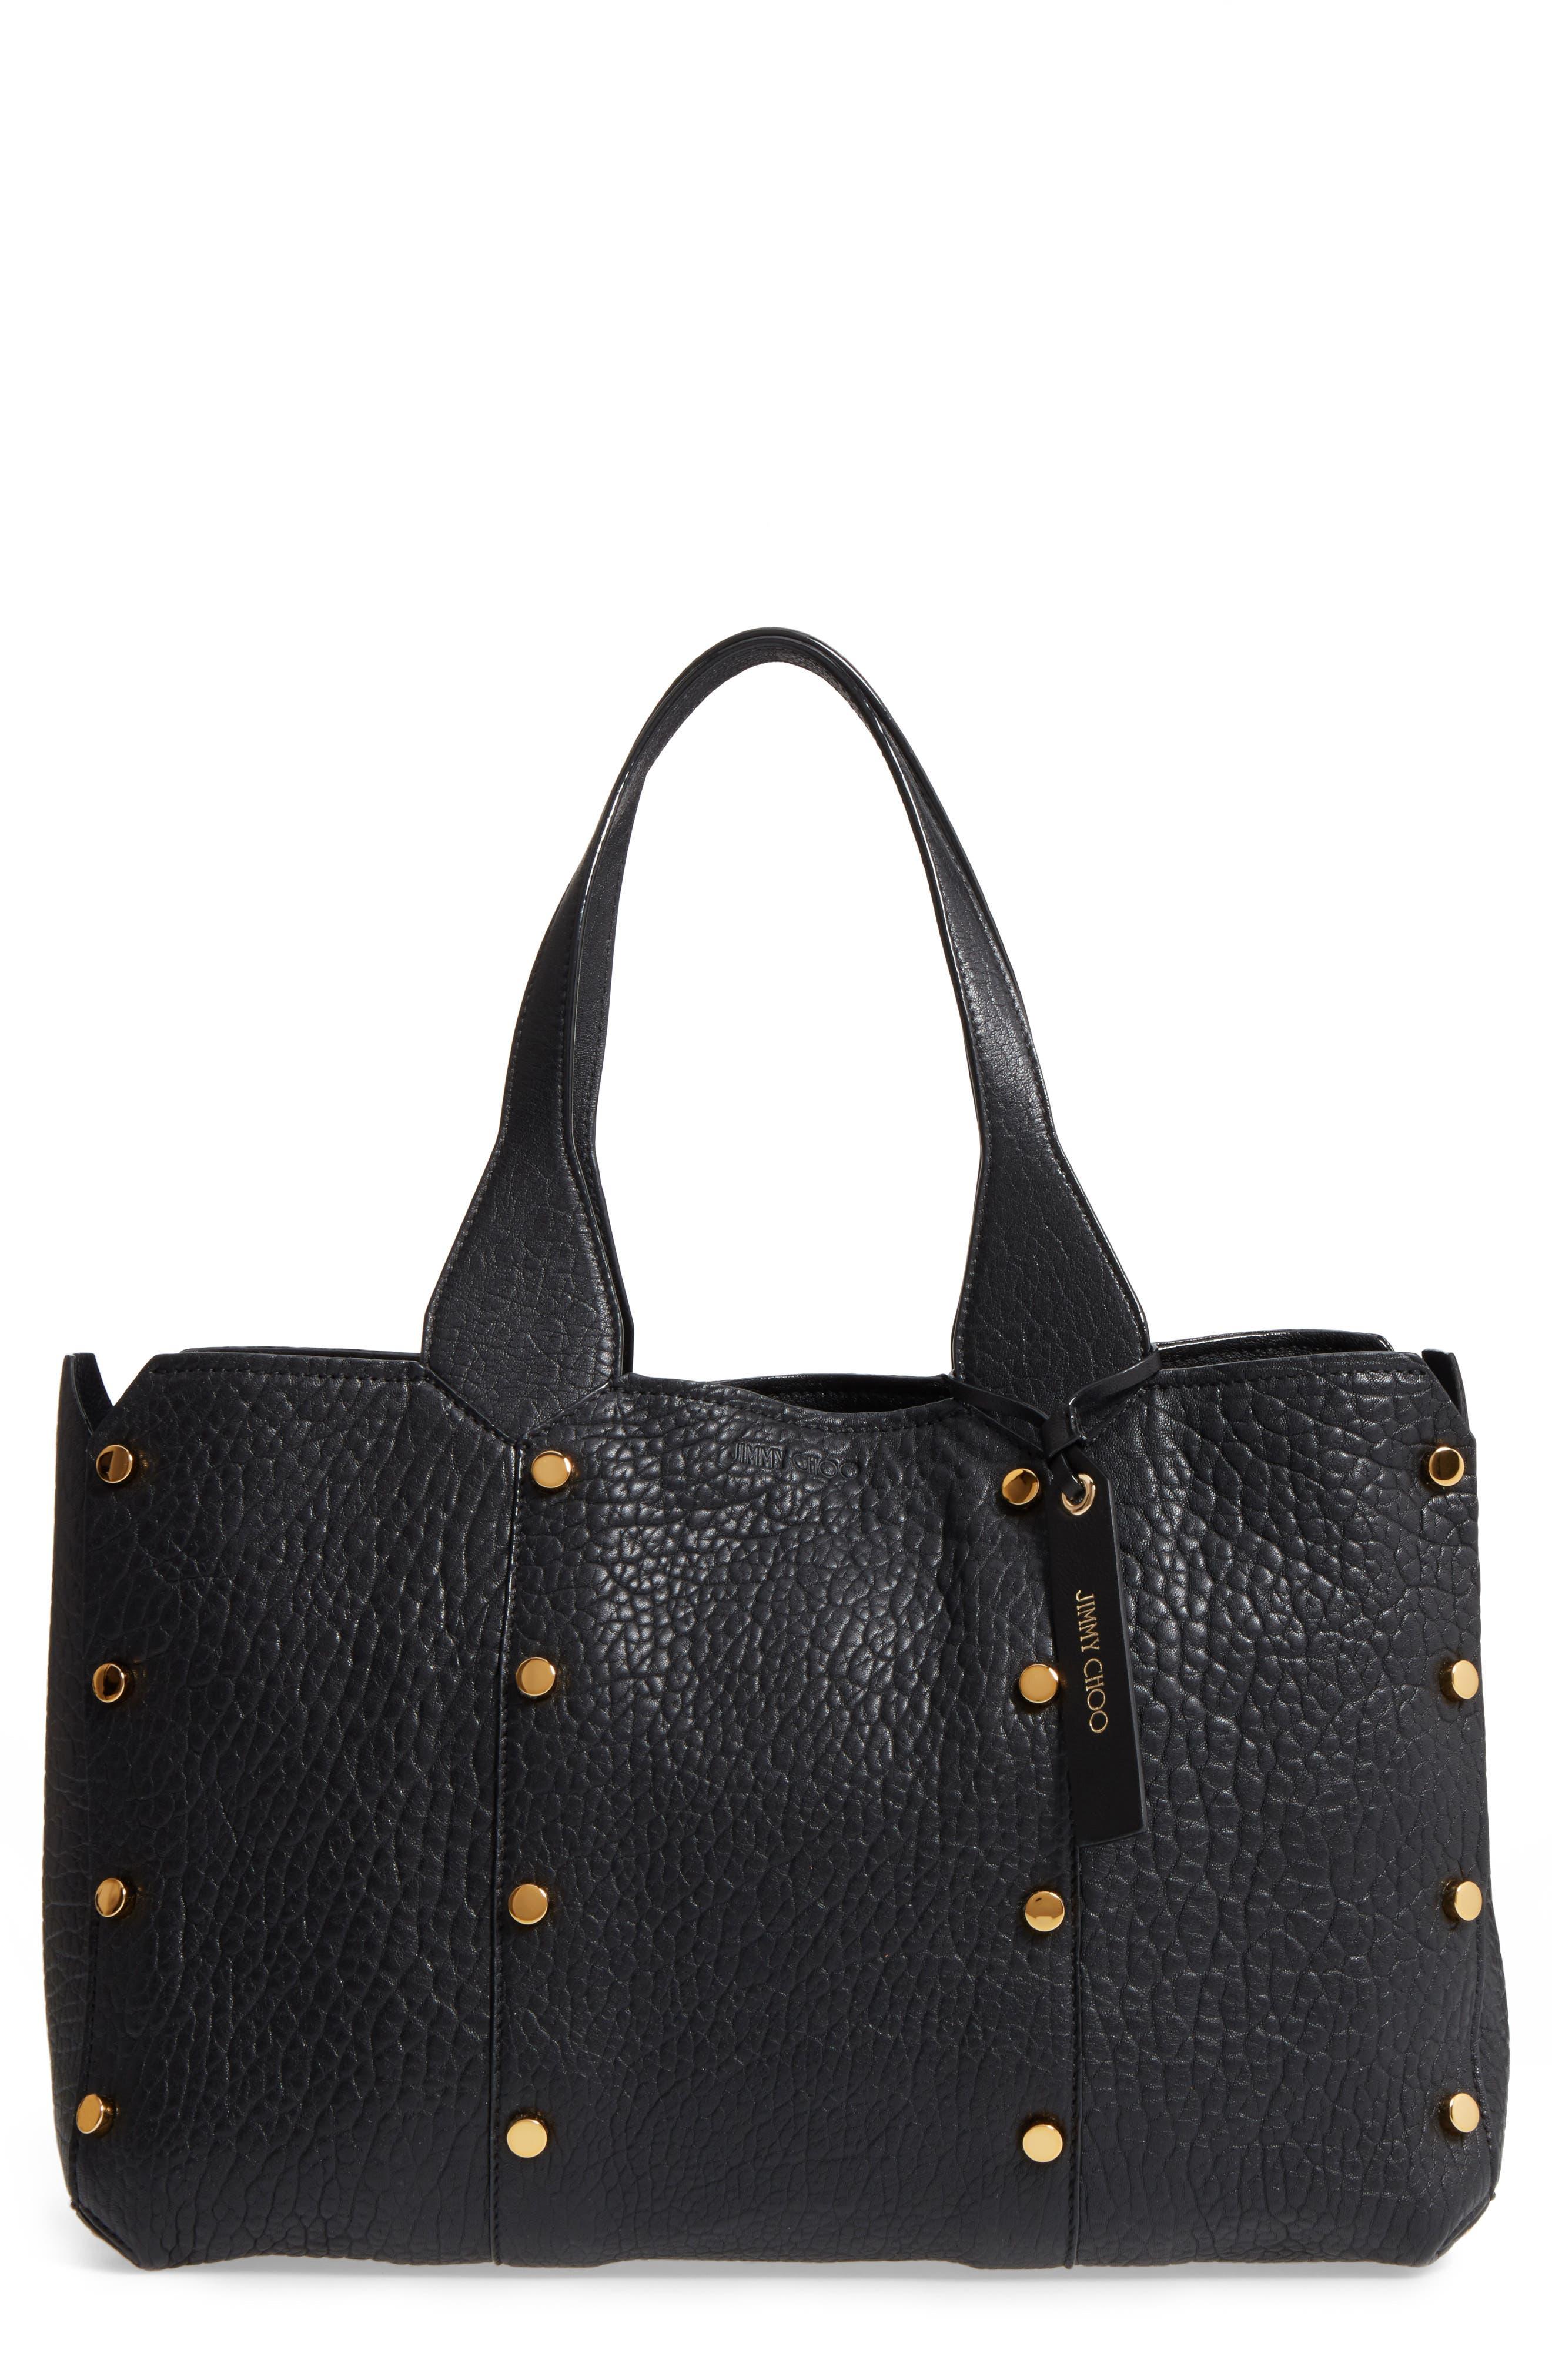 Jimmy Choo Lockett Leather Shopper